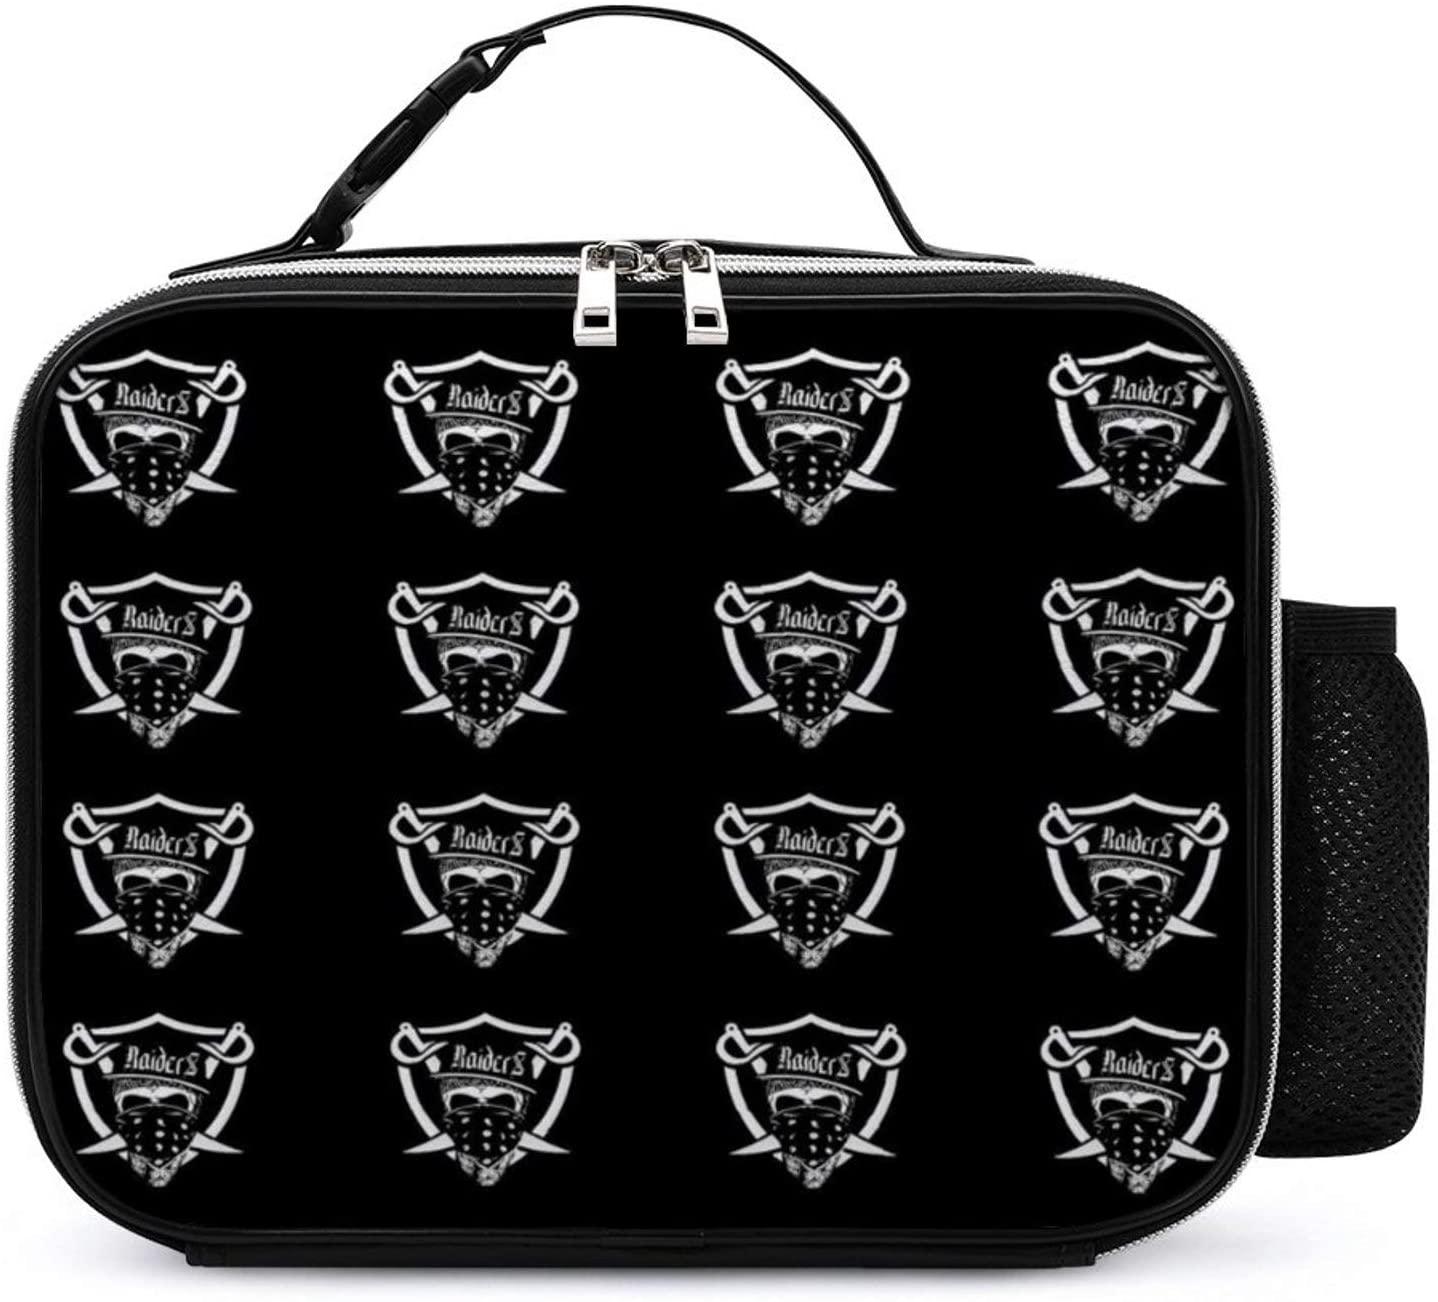 NiYoung Lunchbox Mom Bag Organizer for Men/Girls/Outdoor/Work, Leakproof Multi-Purpose Lunch Holder Premium Handbag Reusable Grocery Container, Oakland City Raiders Football Team Logo